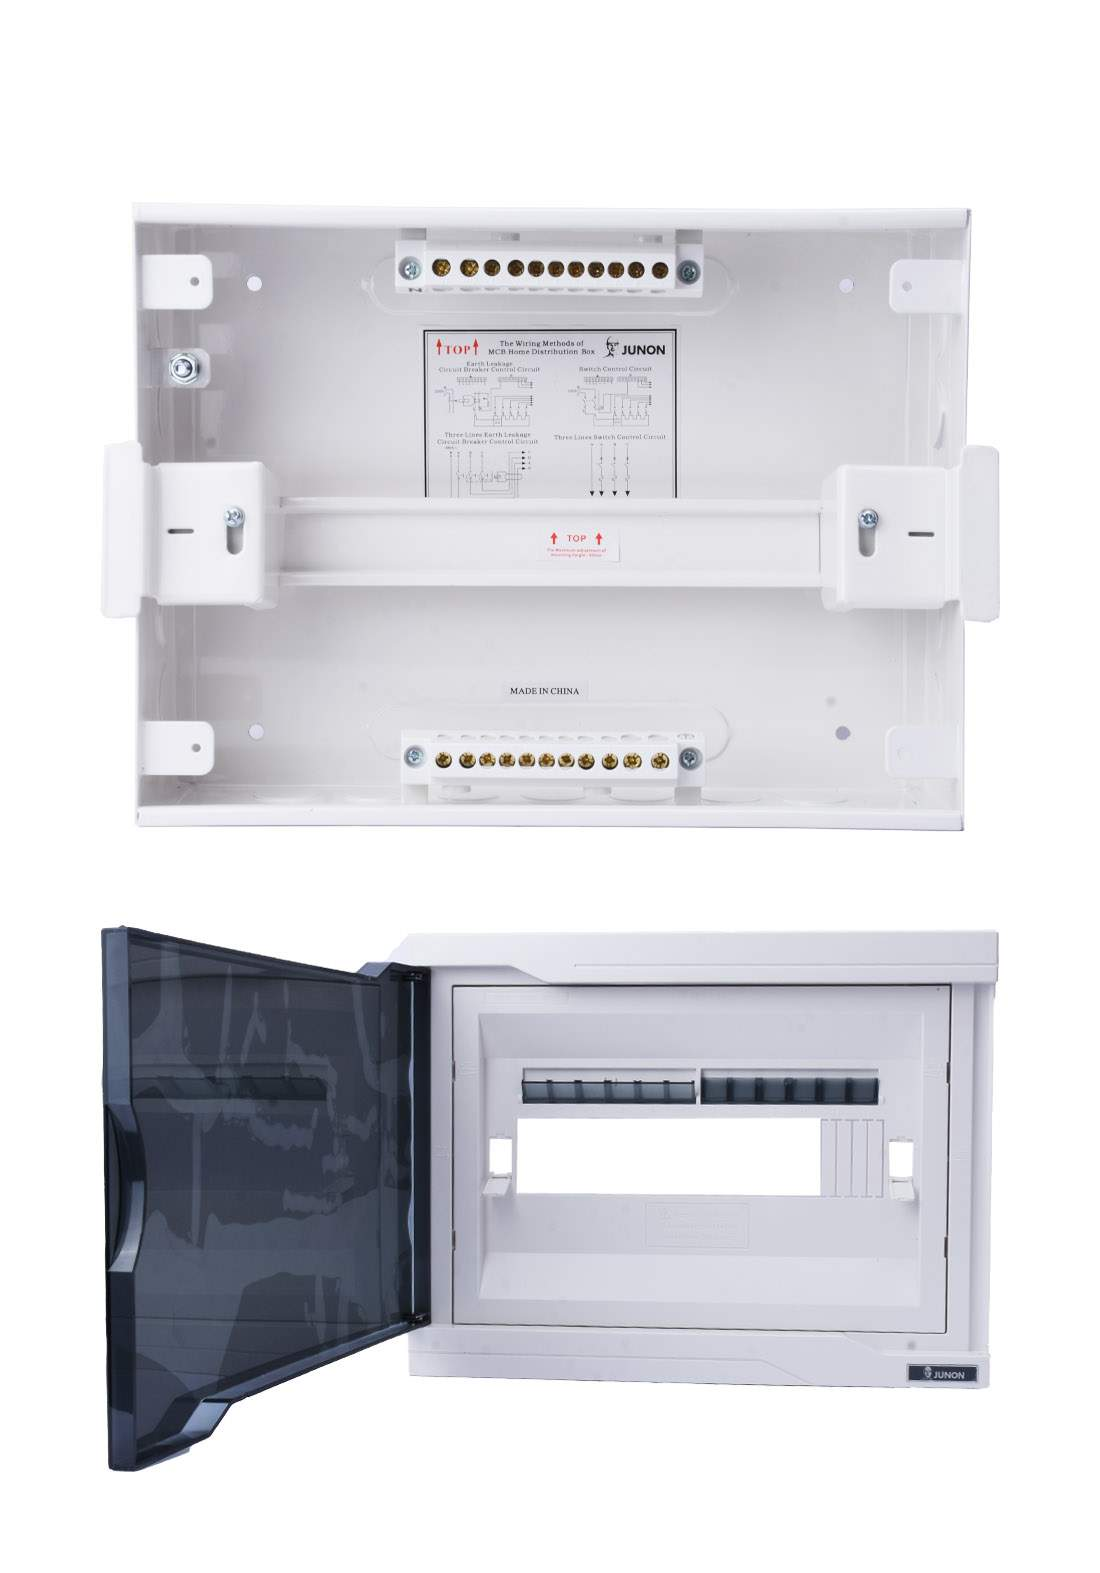 Junon DX18-A12TWB Power Distribution Box 12 Ways بوكس توزيع الكهرباء